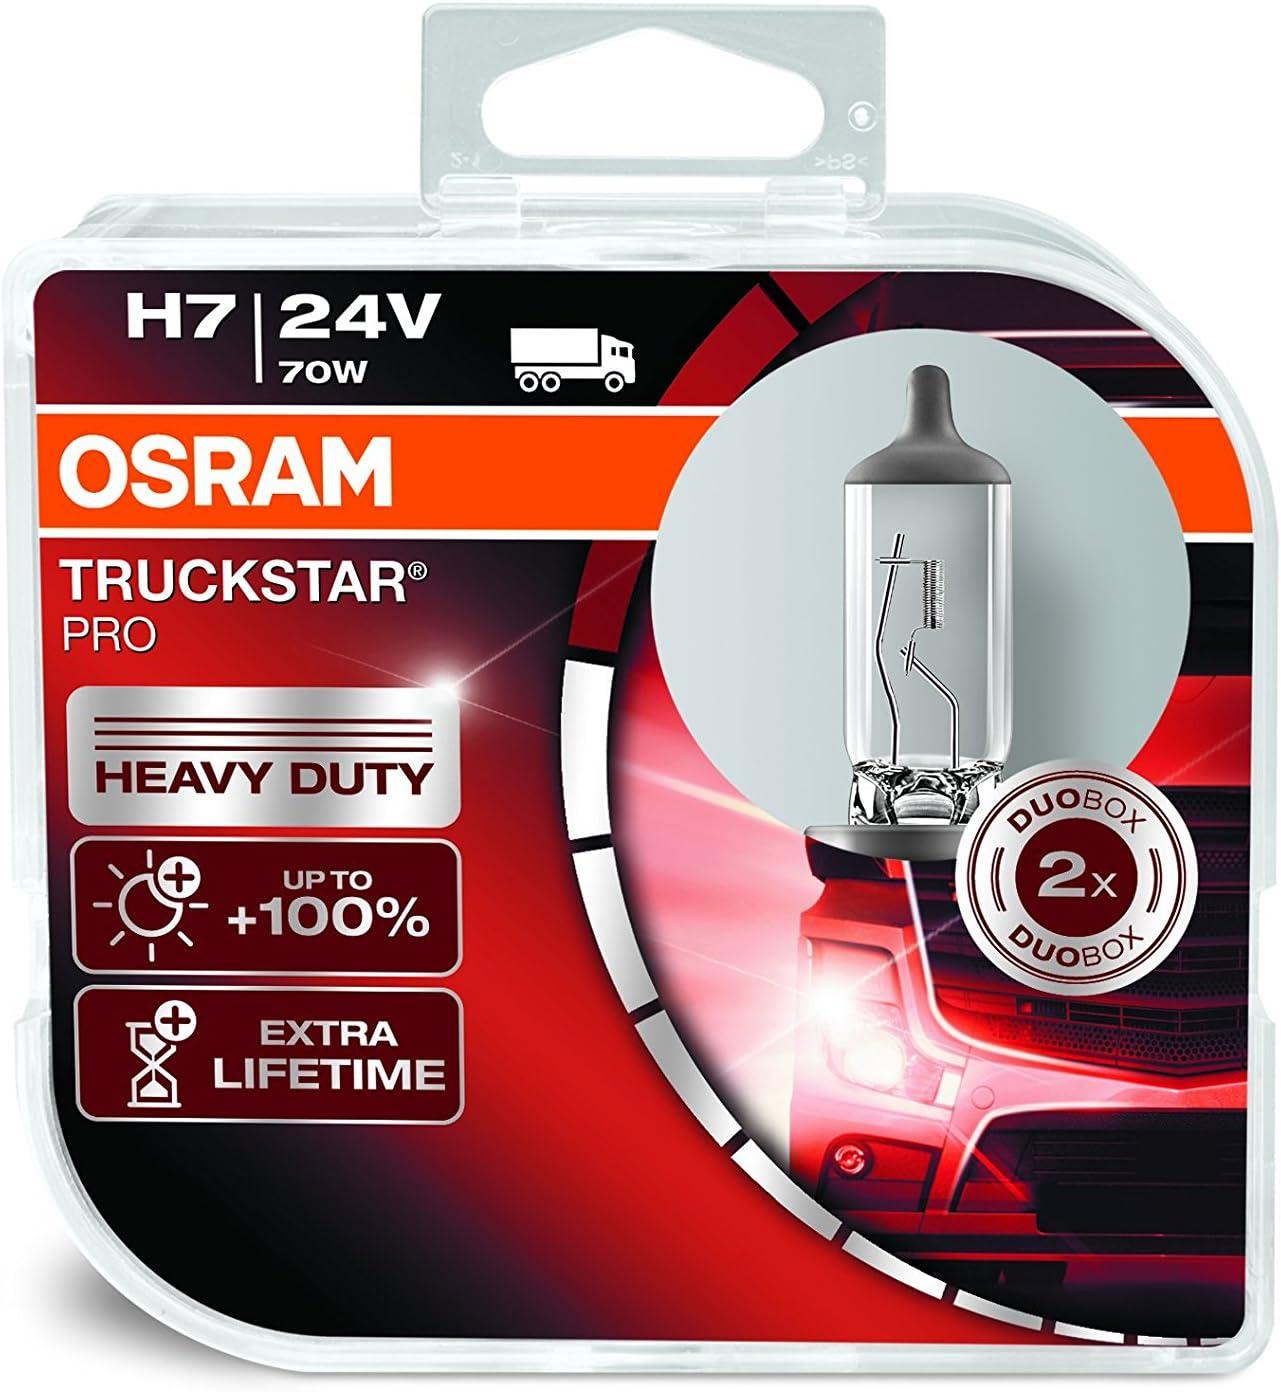 OSRAM TRUCKSTAR PRO H7, lámpara para faros halógena, 64215TSP-HCB, vehículo industrial de 24 V, caja doble (2 unidades)